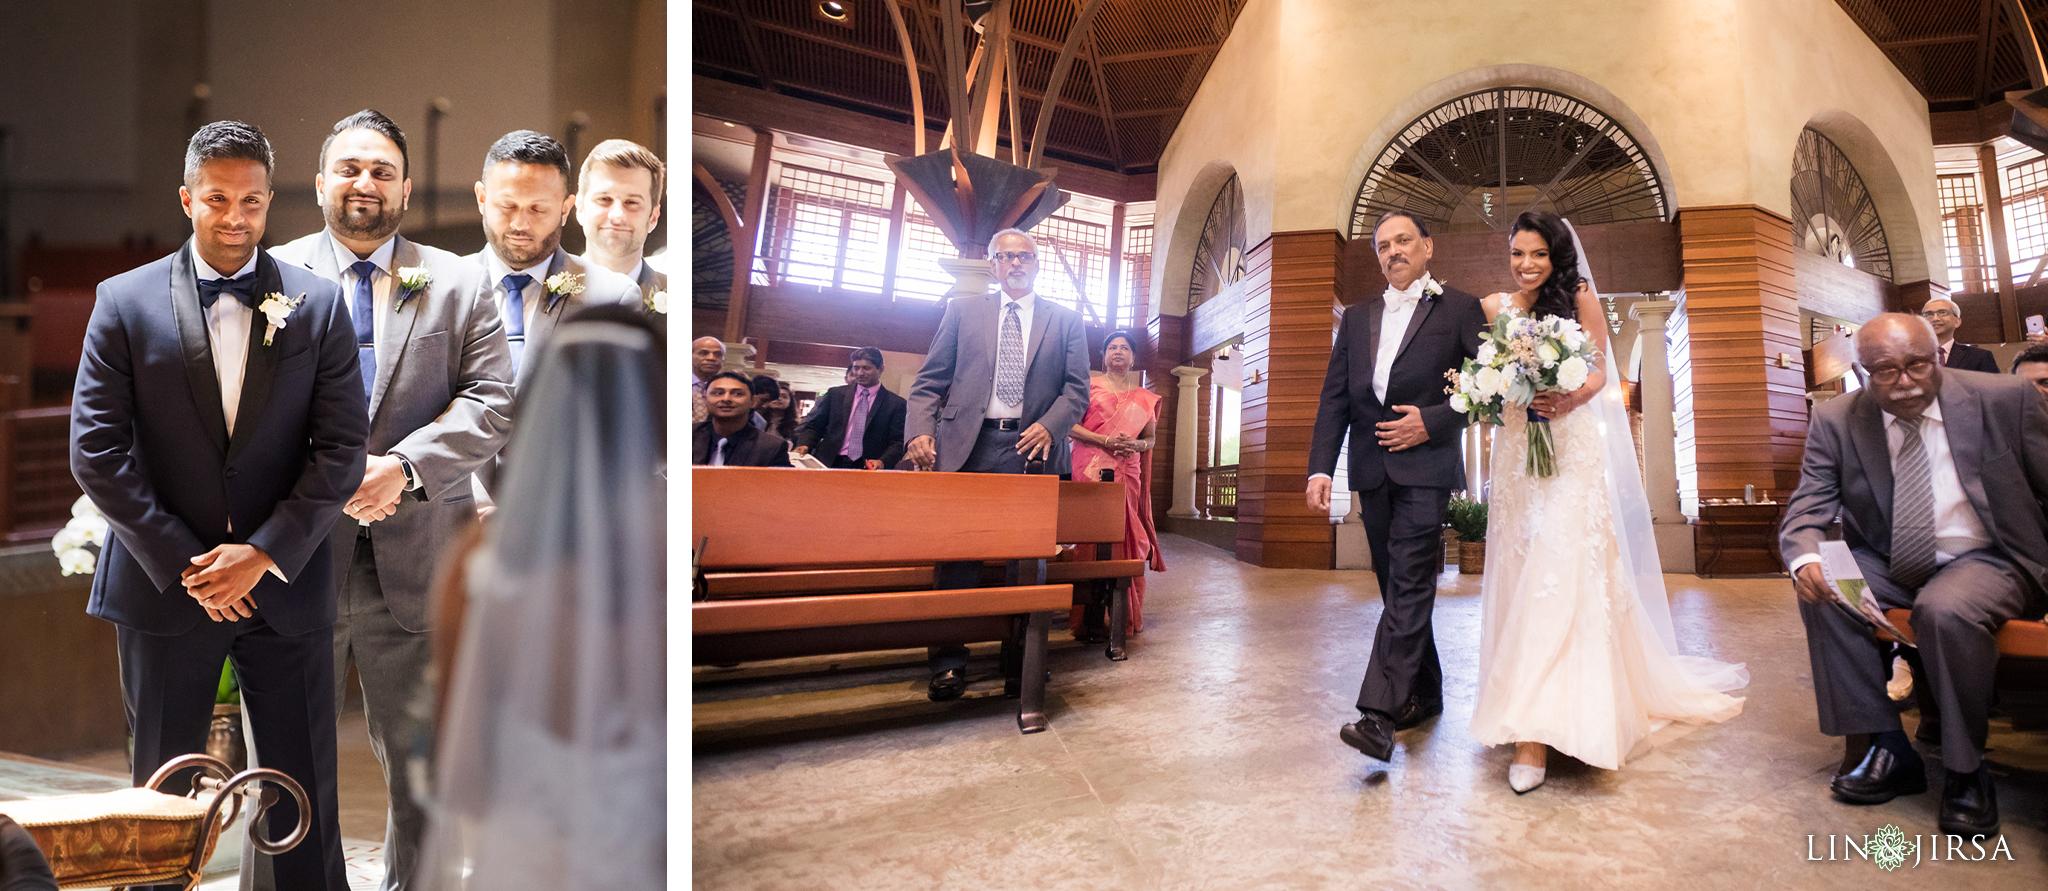 15 St Gregory Church San Diego Indian Wedding Photography